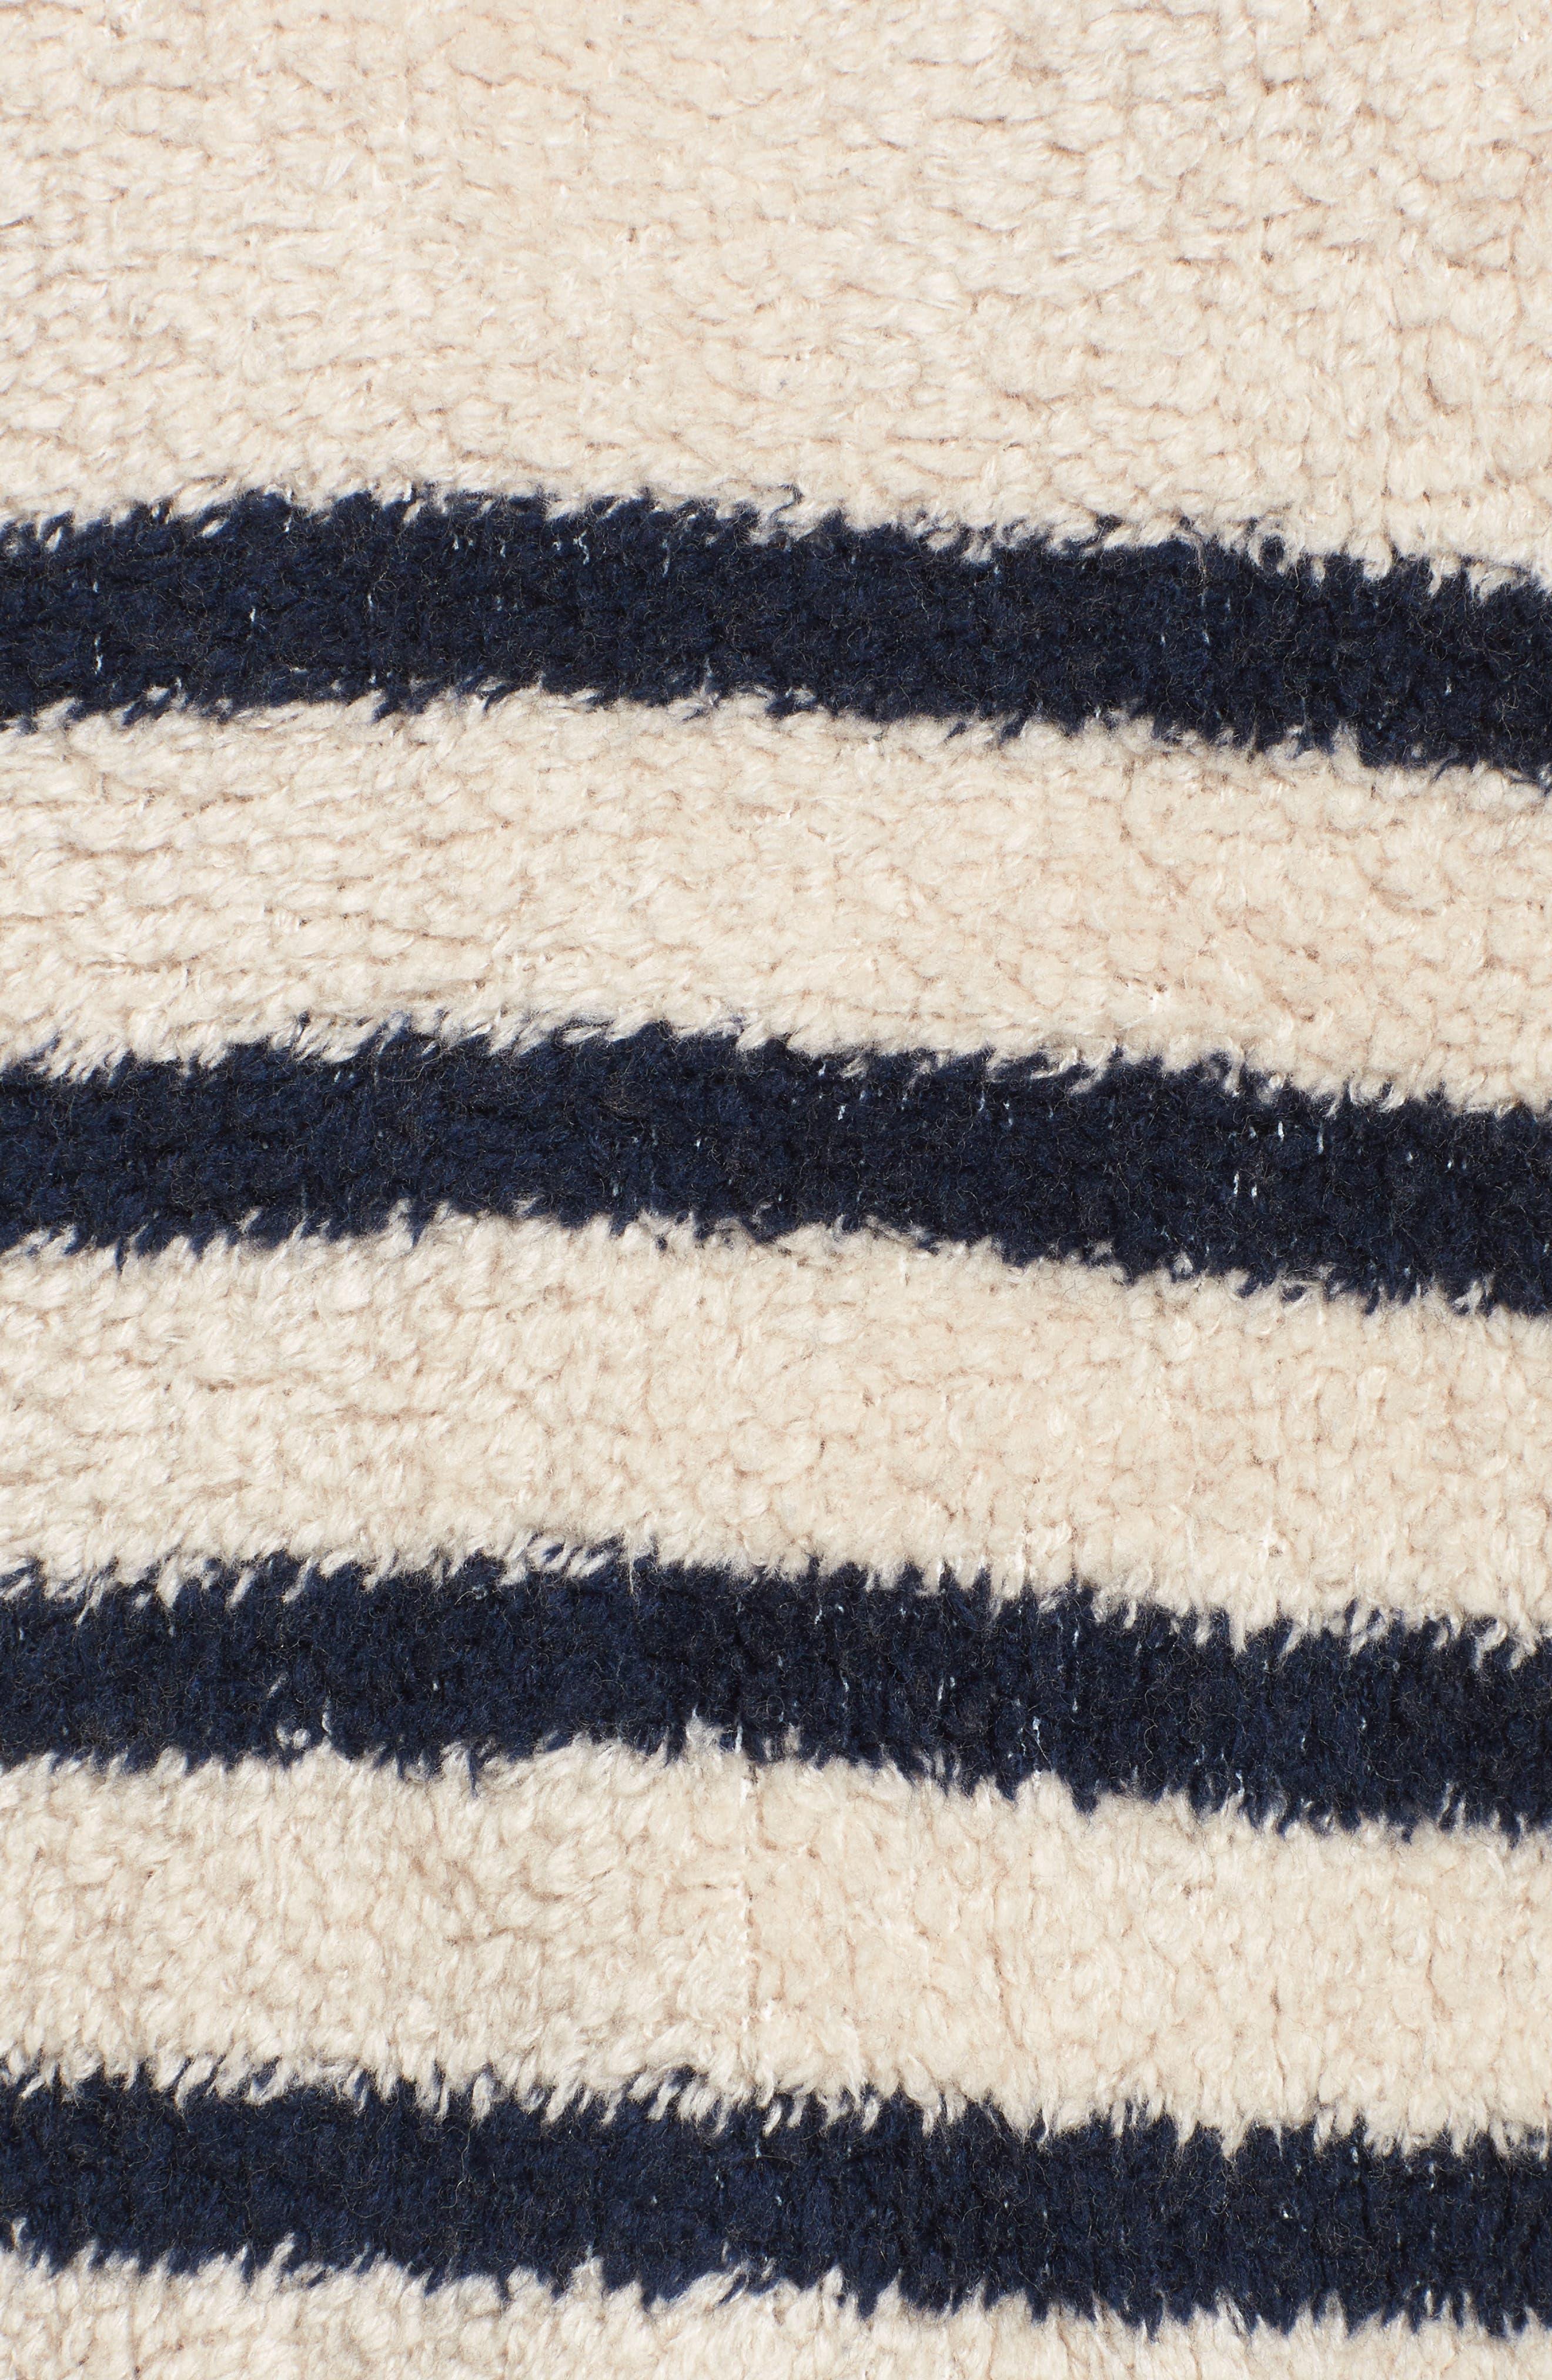 Mariner Stripe Turtleneck Sweater,                             Alternate thumbnail 5, color,                             090